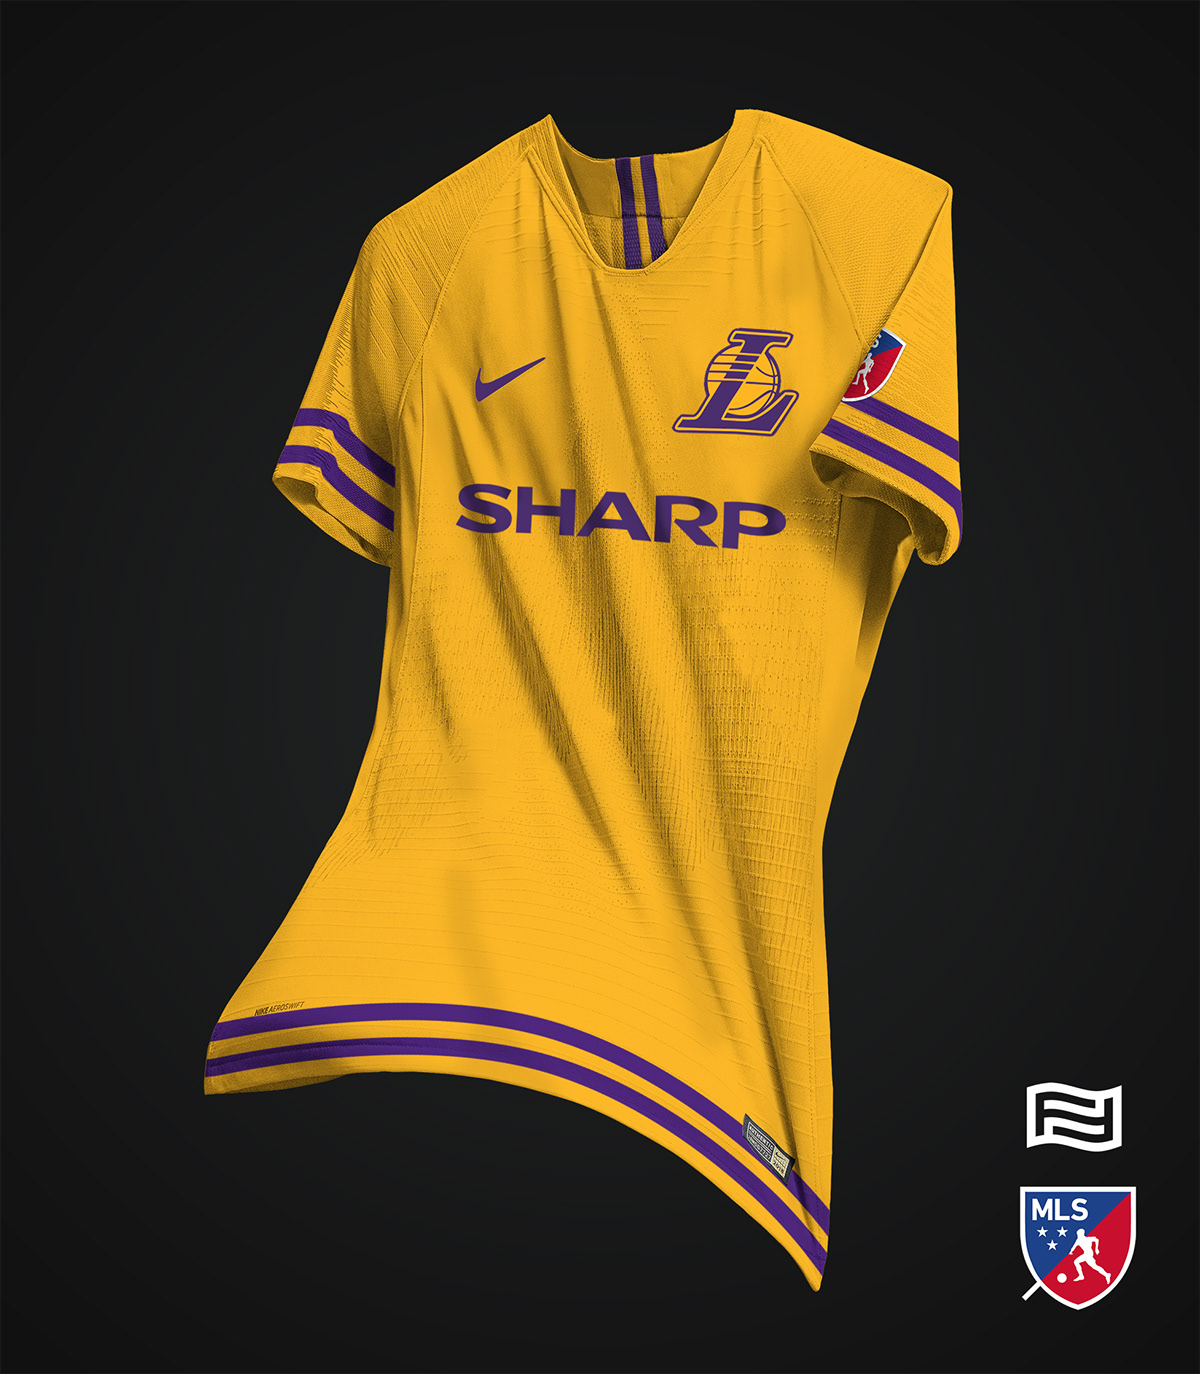 15bdcd550d0 Tremendous - 46 Unique Nike NBA x MLS Concept Kits By Franco ...